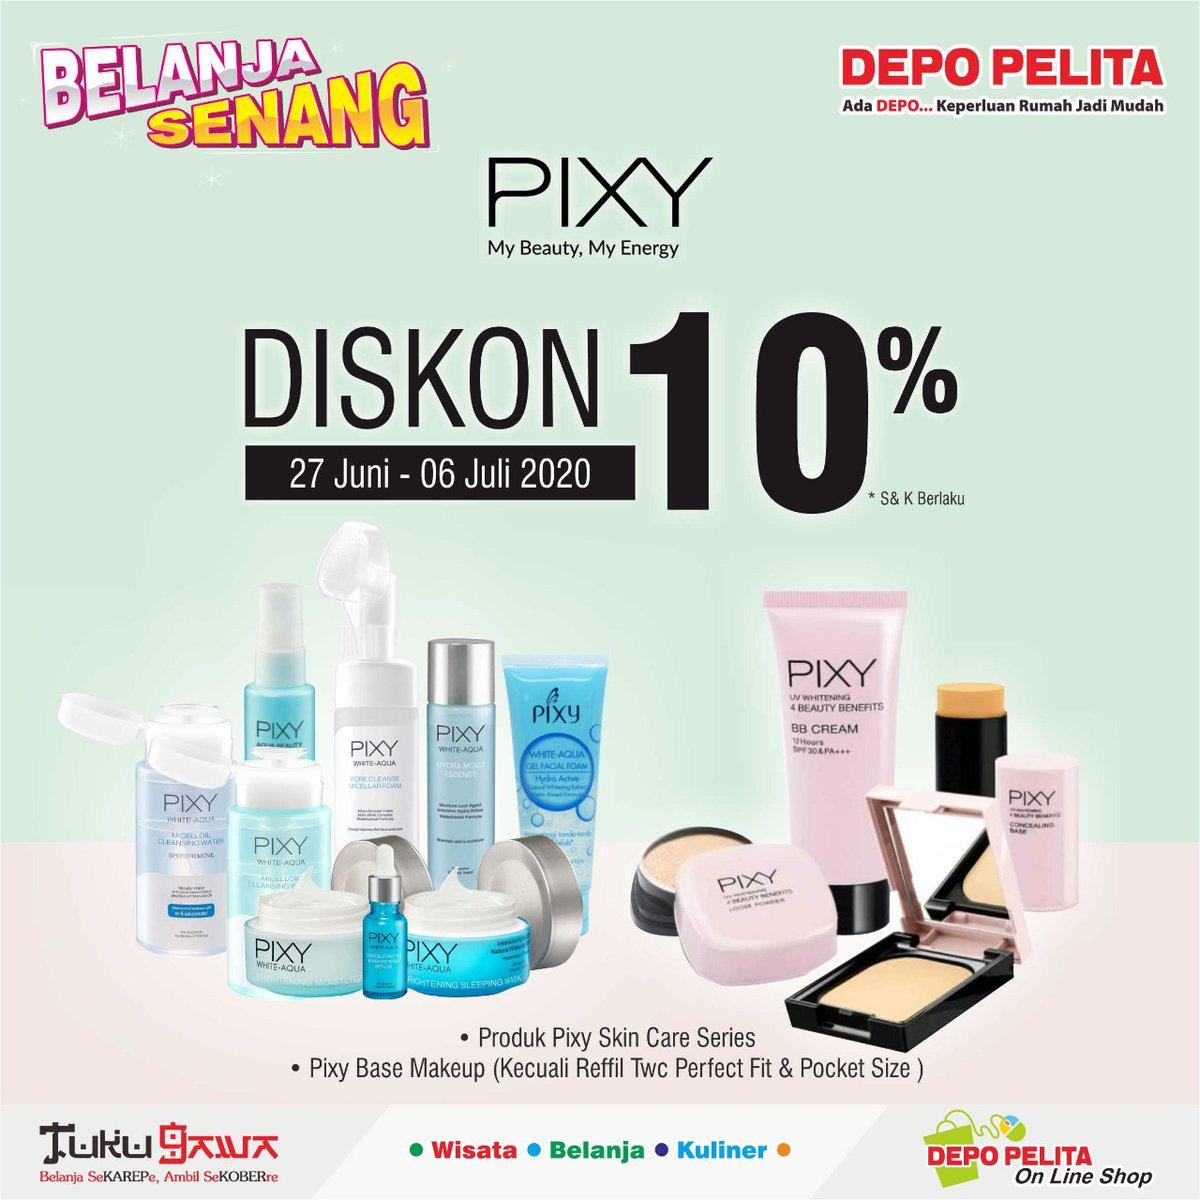 Discount PIXY 10% Hanya Di Depo Pelita Banjarnegara  #pixy #cosmetic #salonhijab #riaspengantin #cosmeticbanjarnegara #cosmeticwonosobo #COVID19 #depopelitabanjarnegara https://t.co/d9SVD34wmC